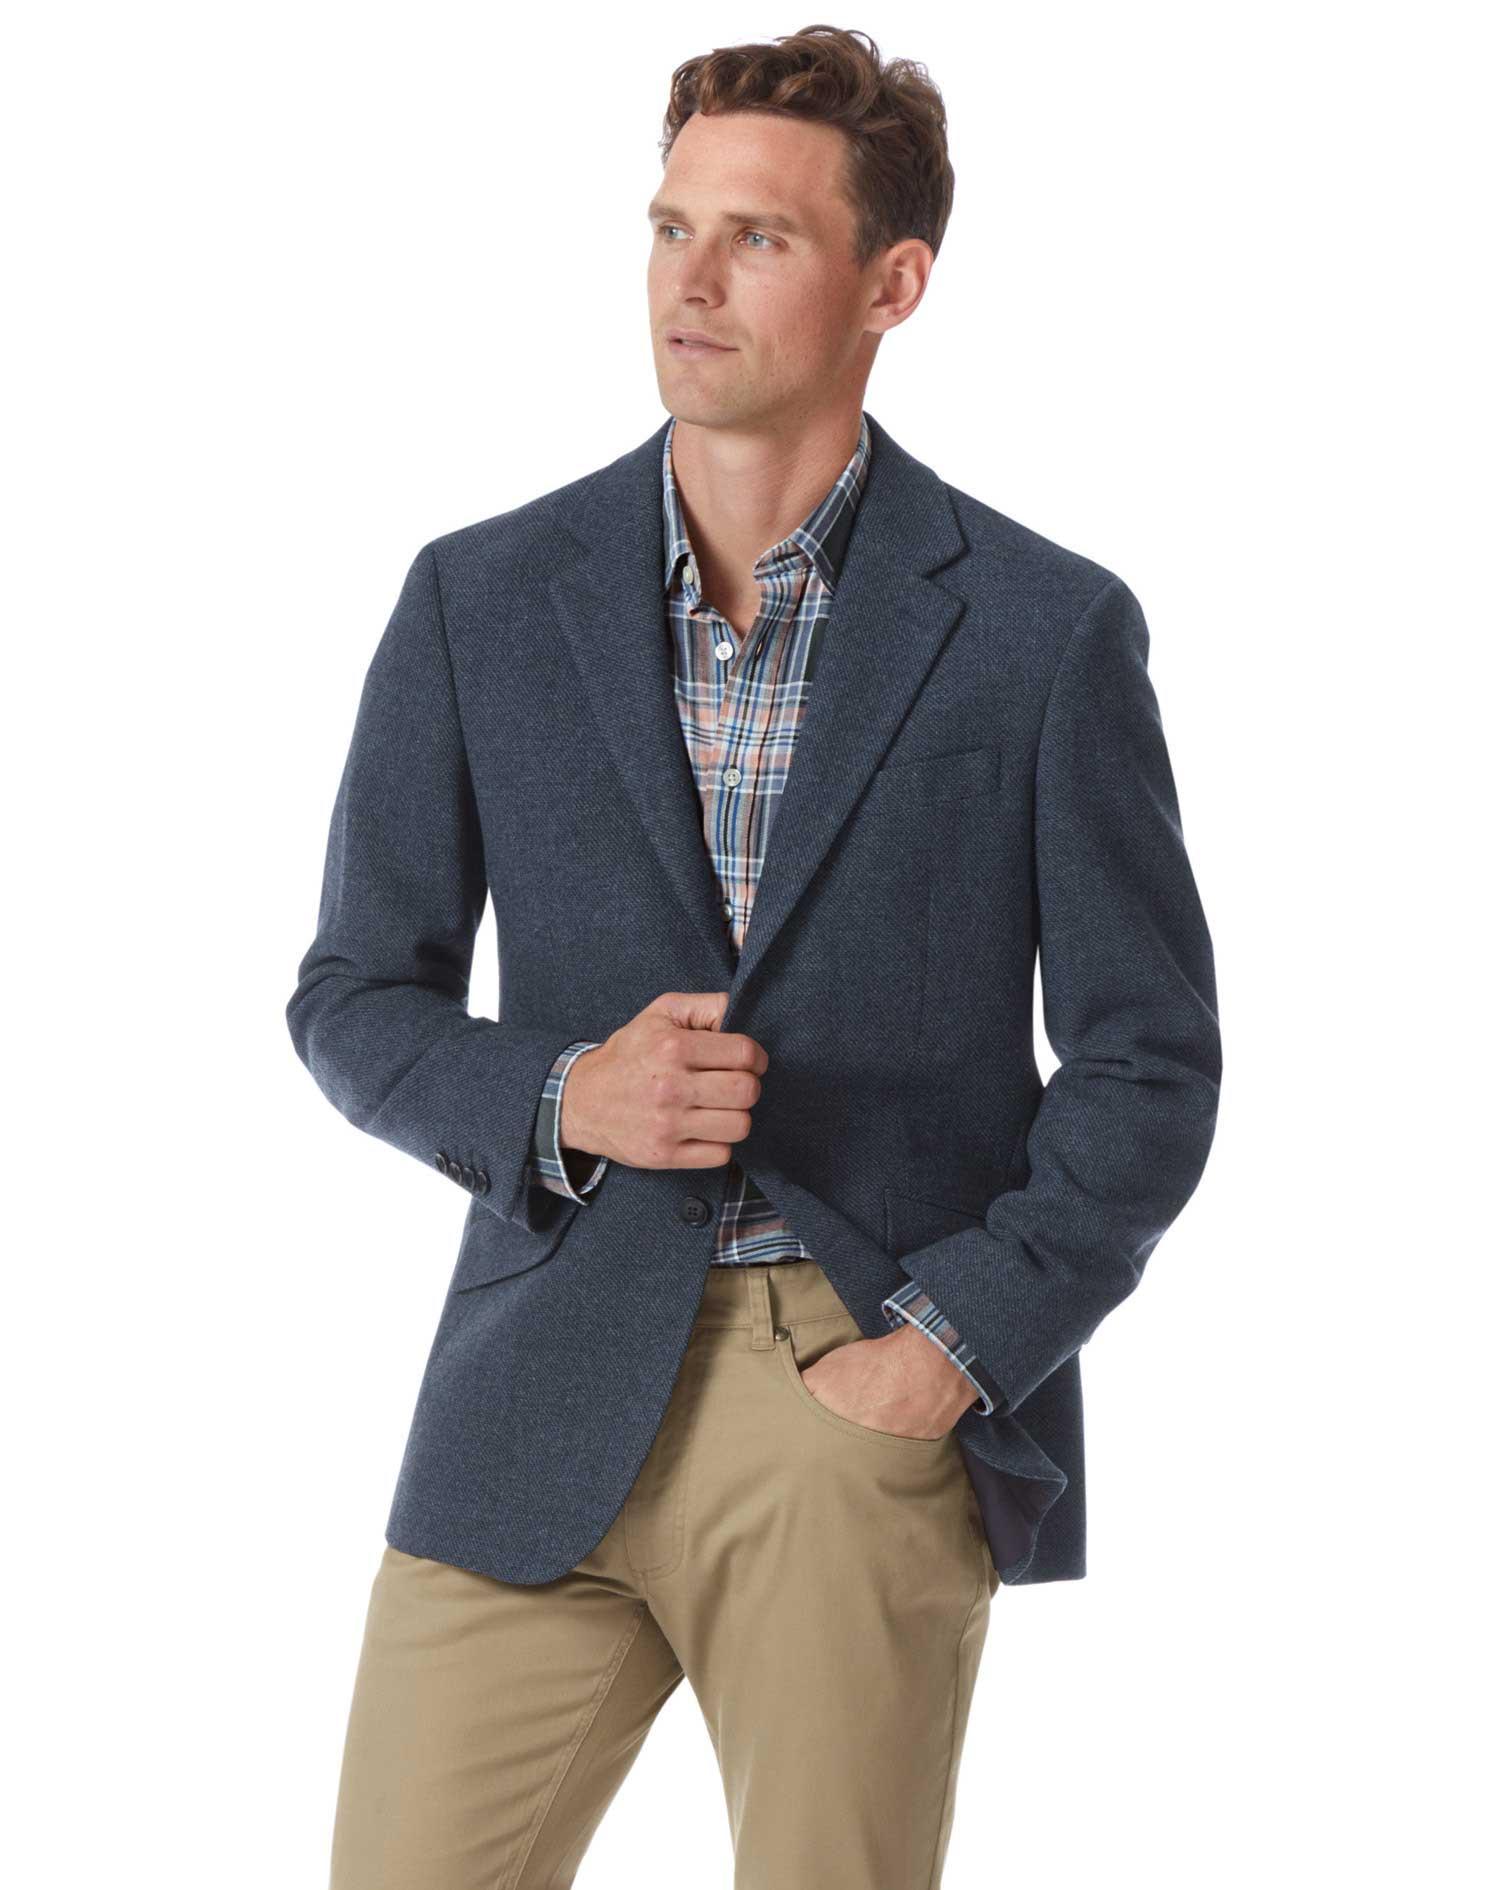 Classic Fit Indigo Blue Wool Jacket Size 38 Regular by Charles Tyrwhitt